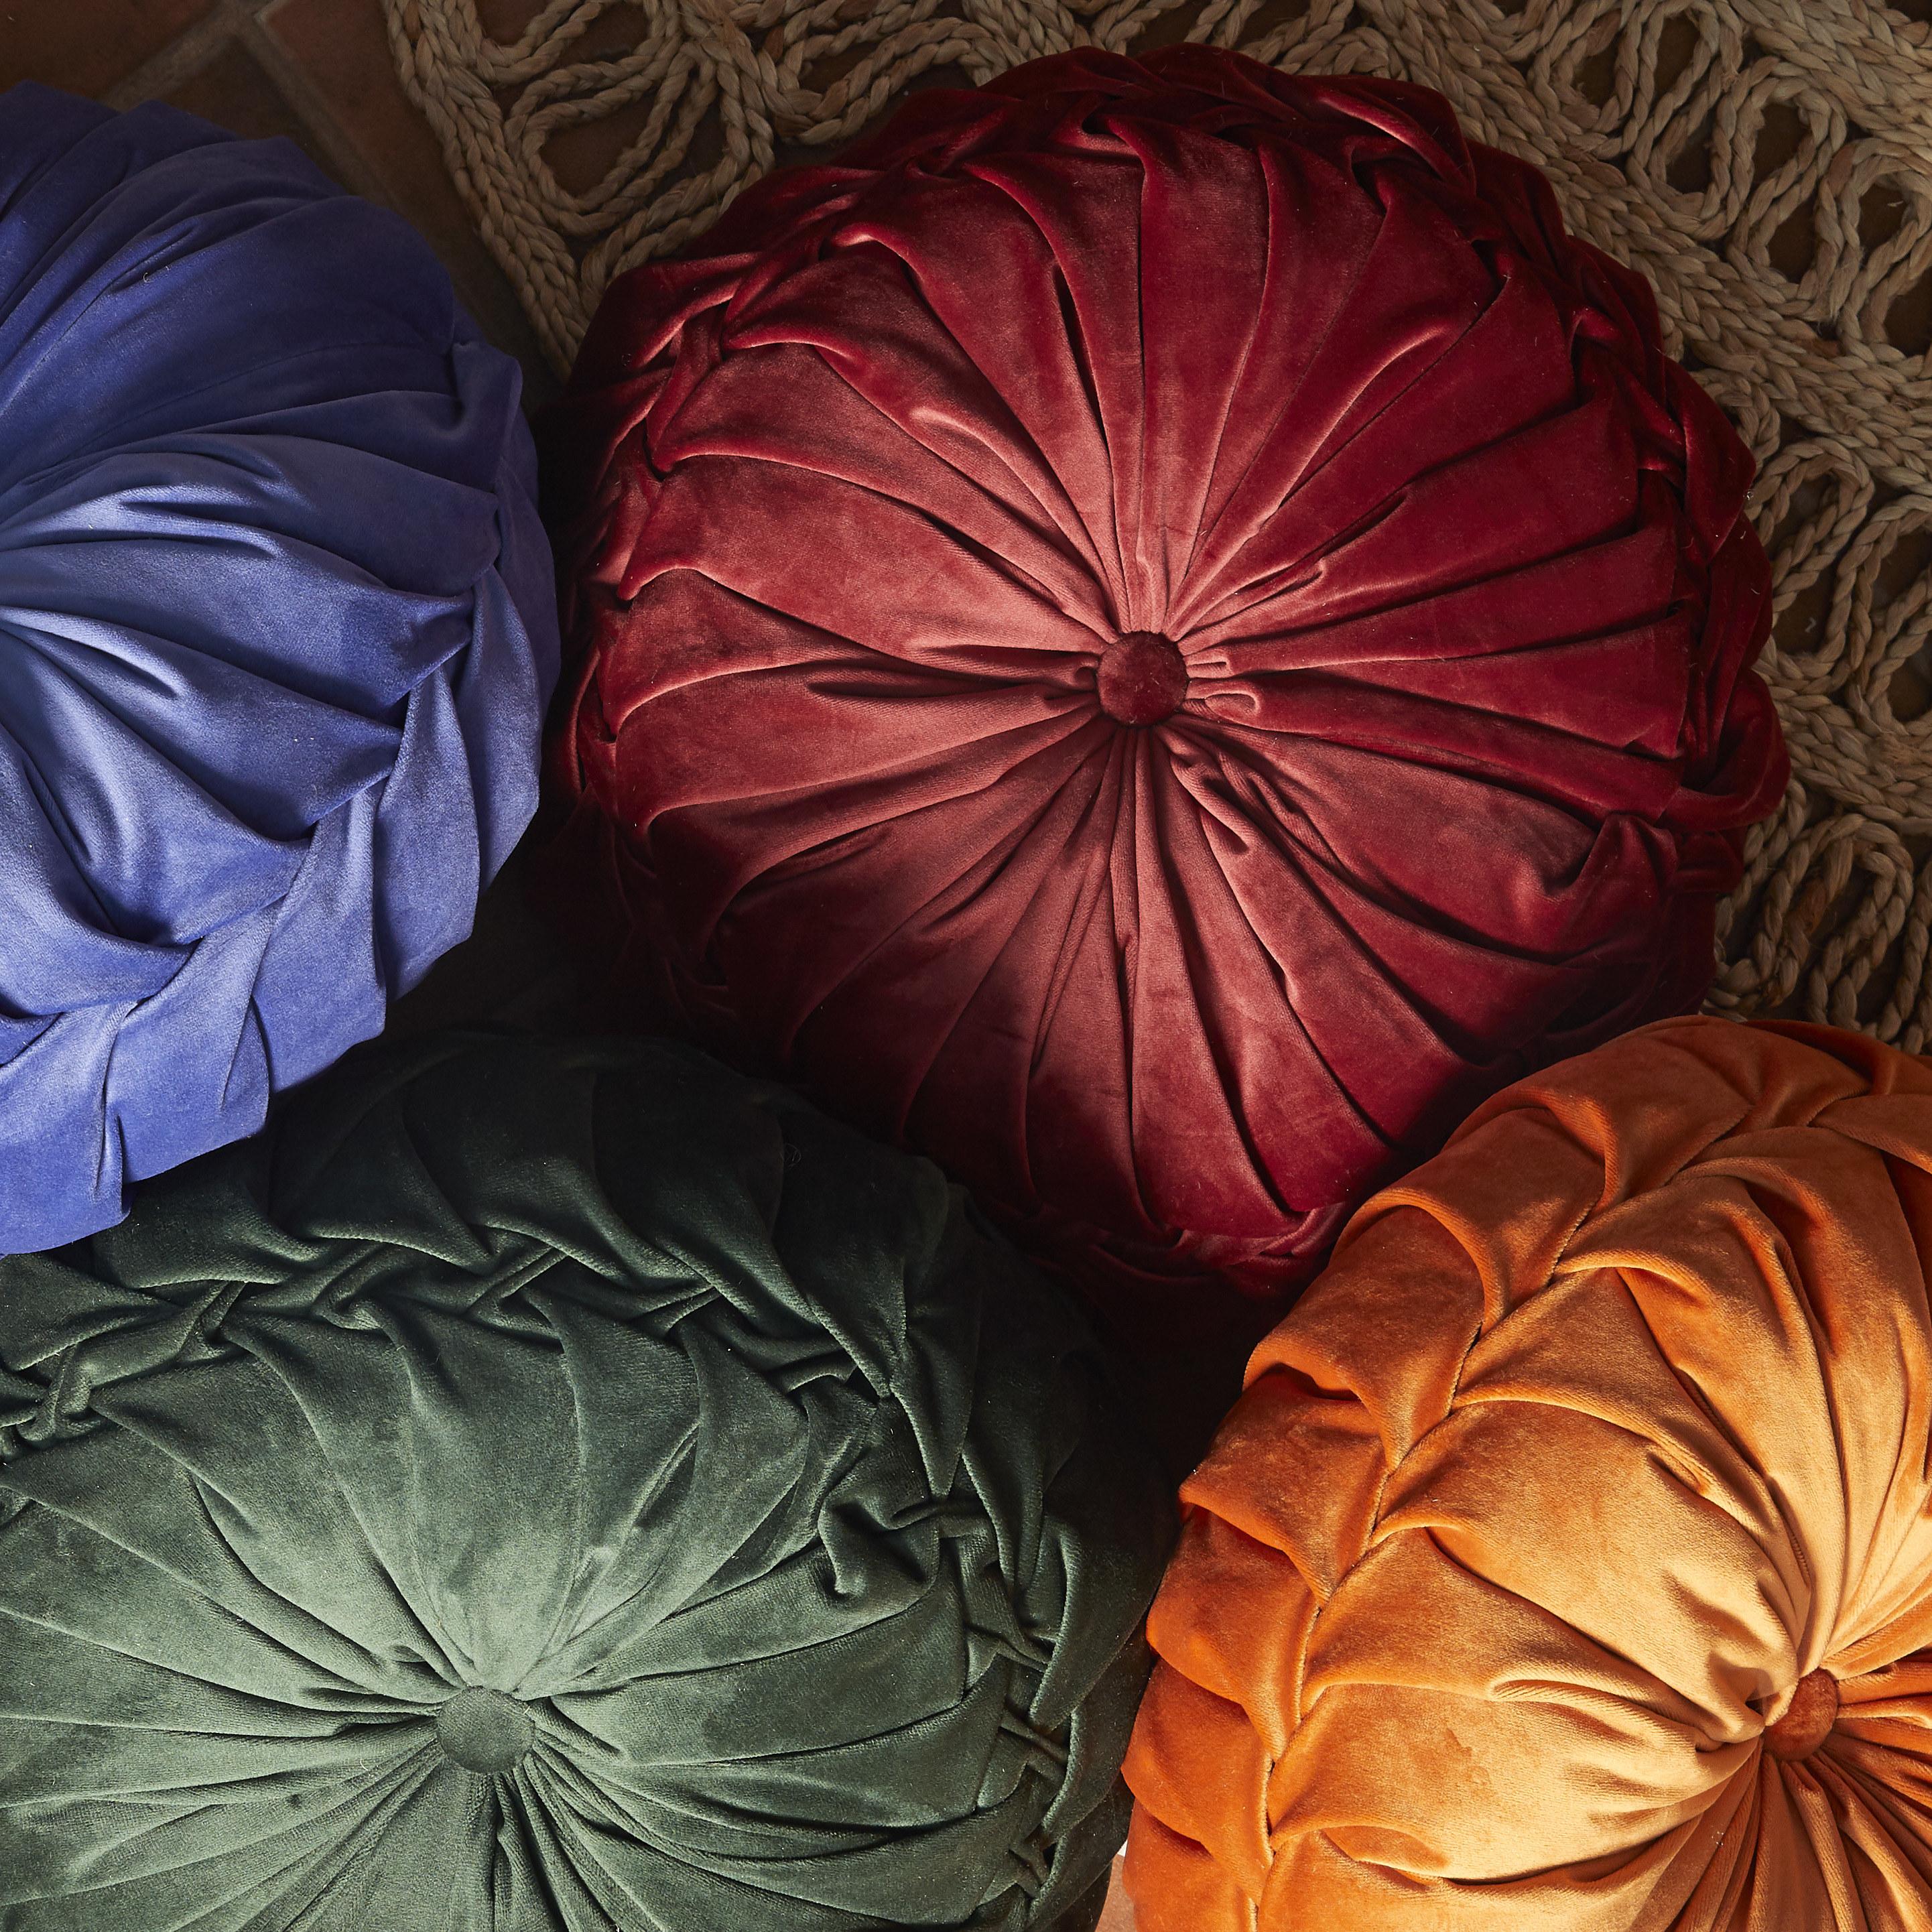 Circular, velvet pillows in jewel colors